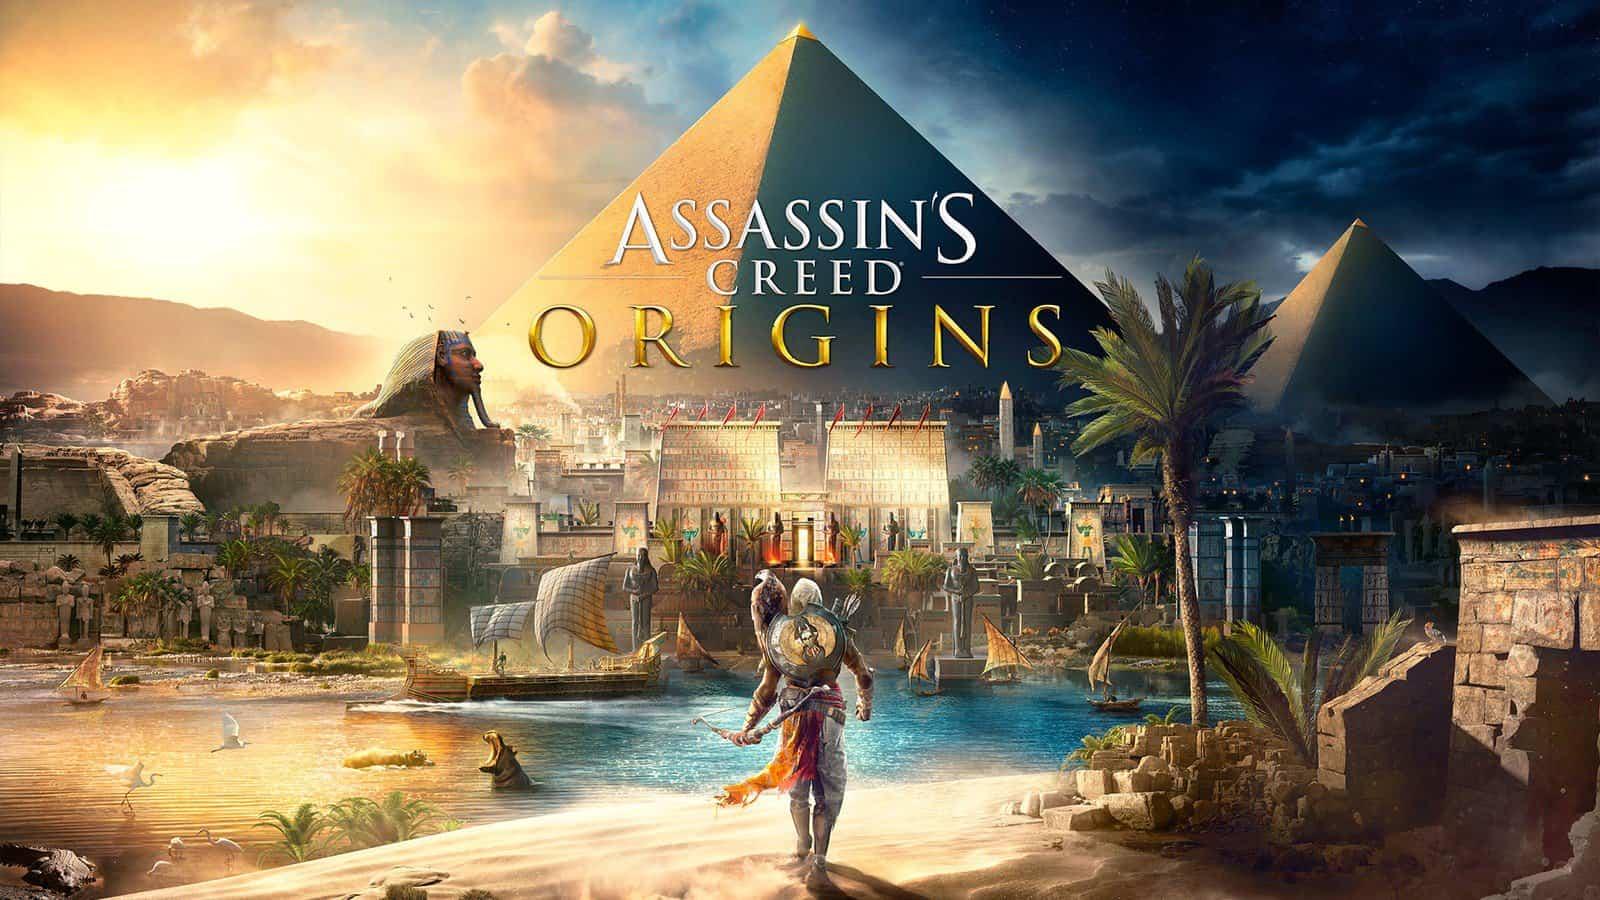 Assassin's Creed Origins Apk iOS Latest Version Free Download